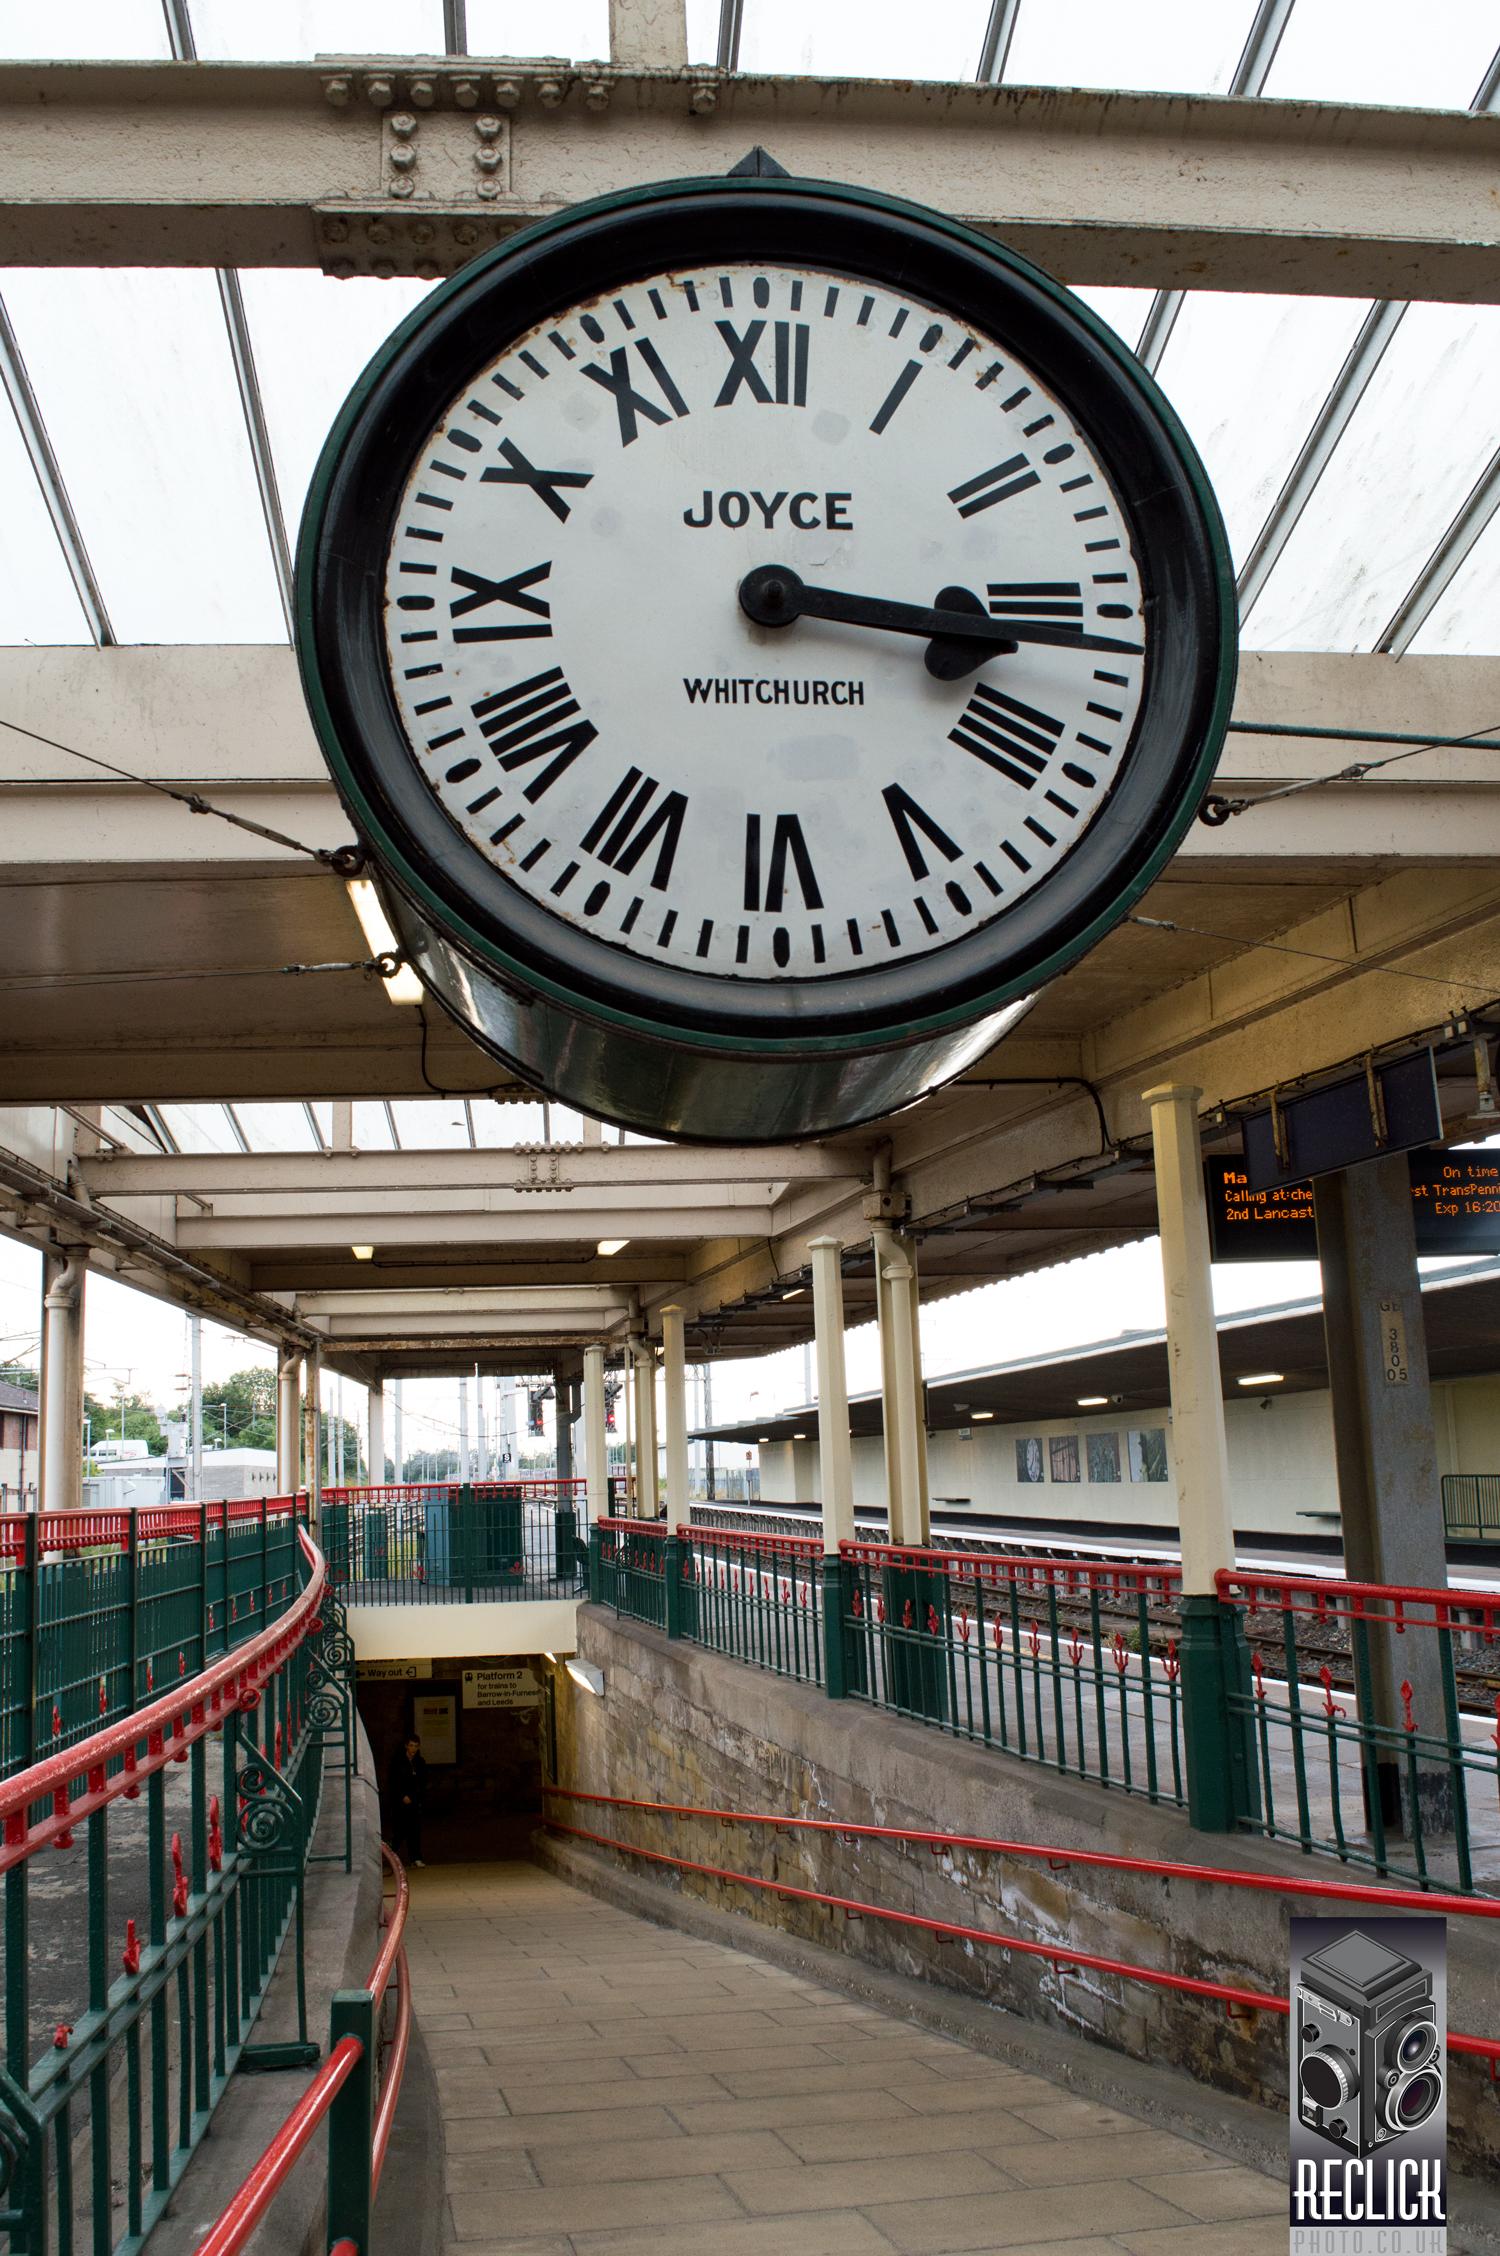 Carnforth Railway Station Lancashire clock movie film Brief Encounter David Lean Noel Coward Celia Johnson trevor howard love story